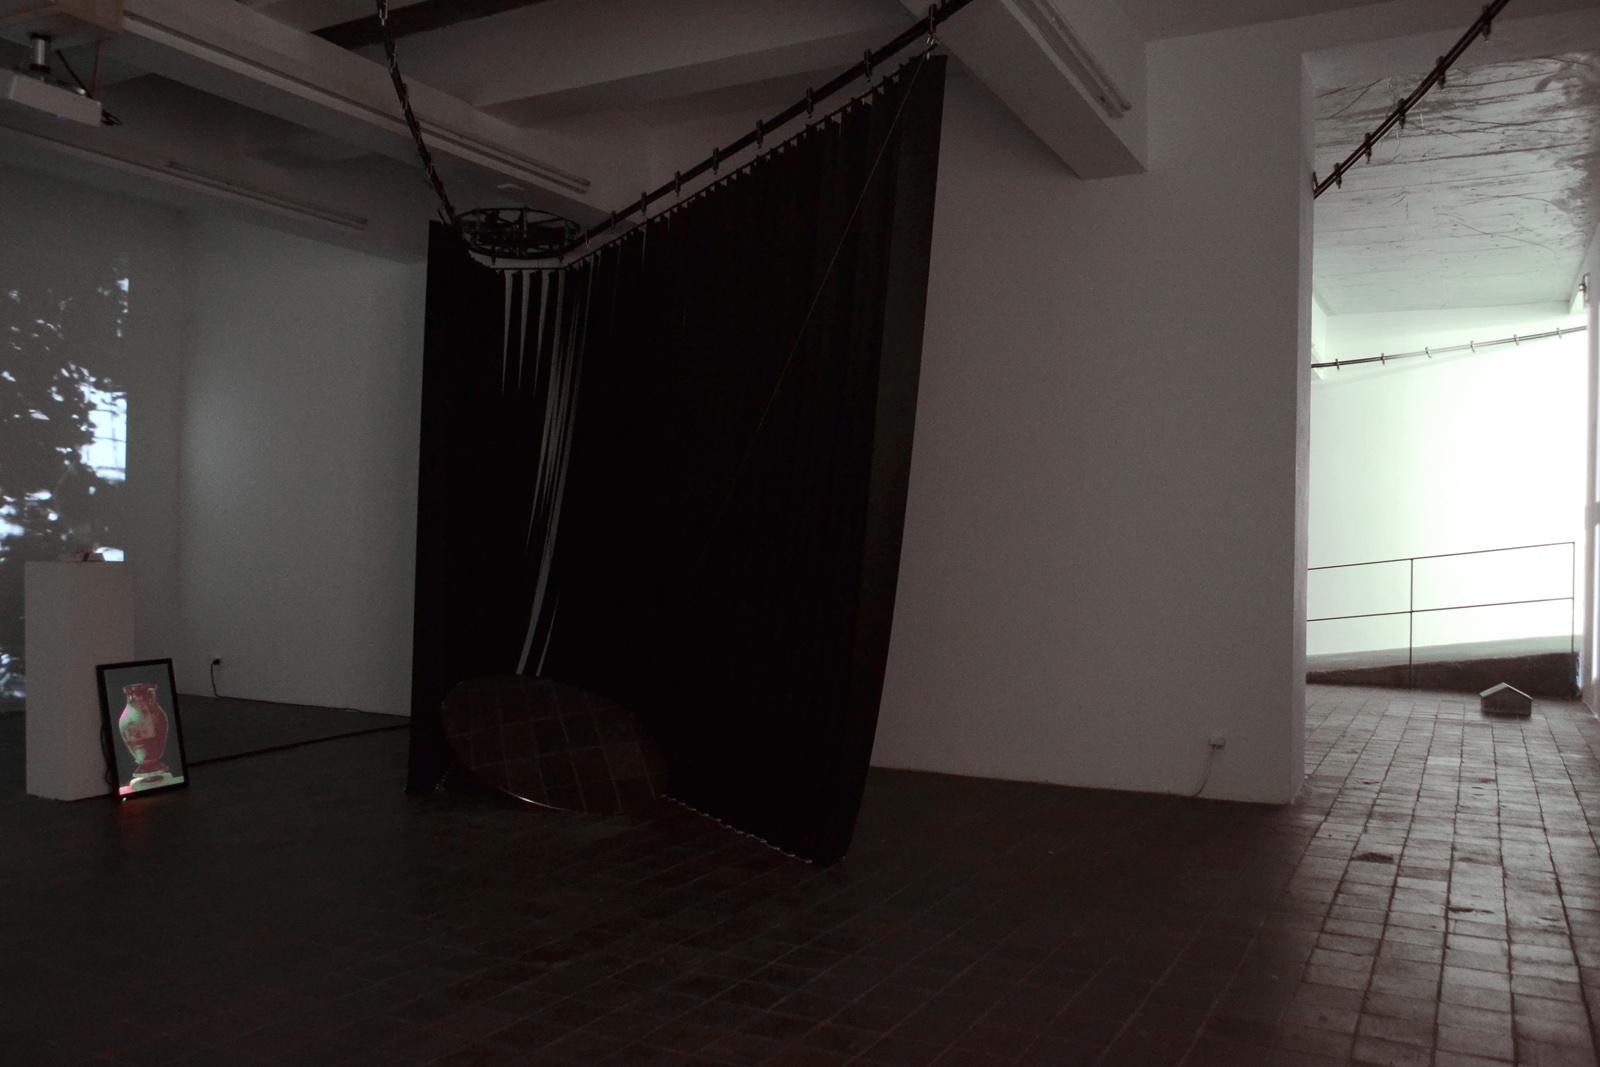 stay hungry Pätzug/Hertweck Revisionsklappe @ c/o Kunstpunkt Berlin Art Week Michel Aniol Meike Kuhnert